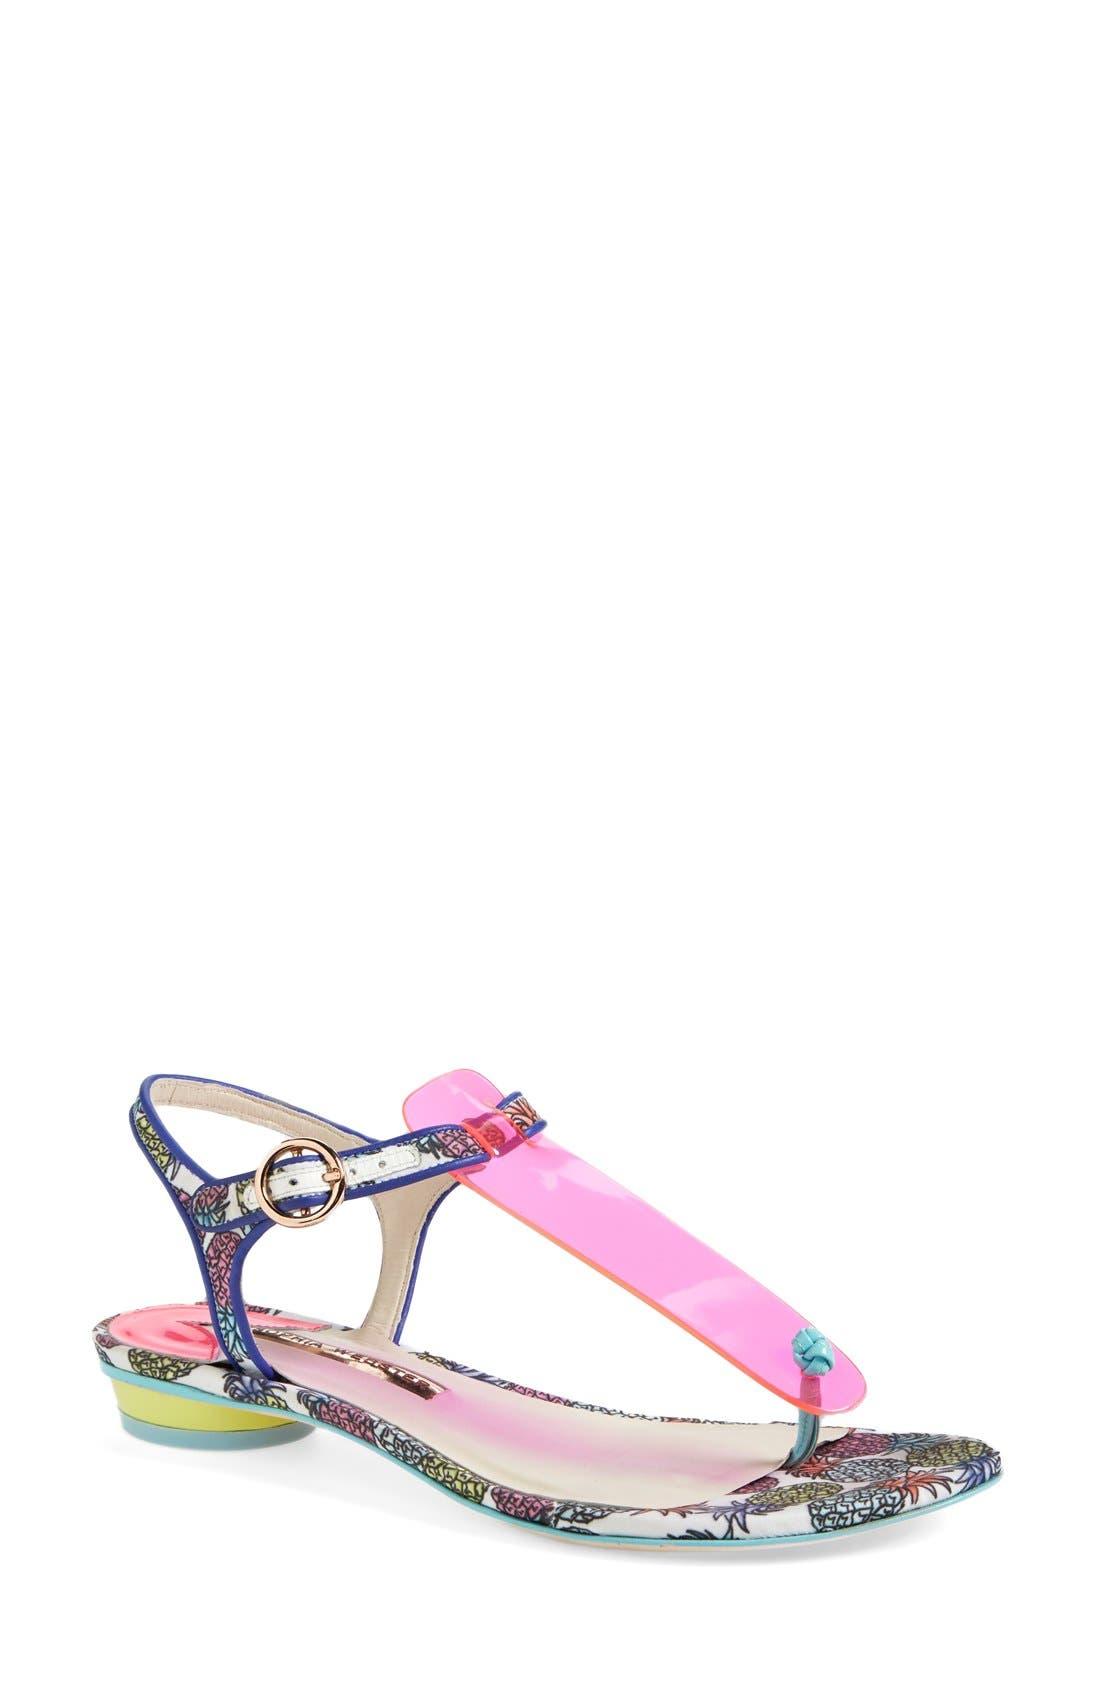 Main Image - Sophia Webster 'Thalia' Pineapple Sandal (Women)